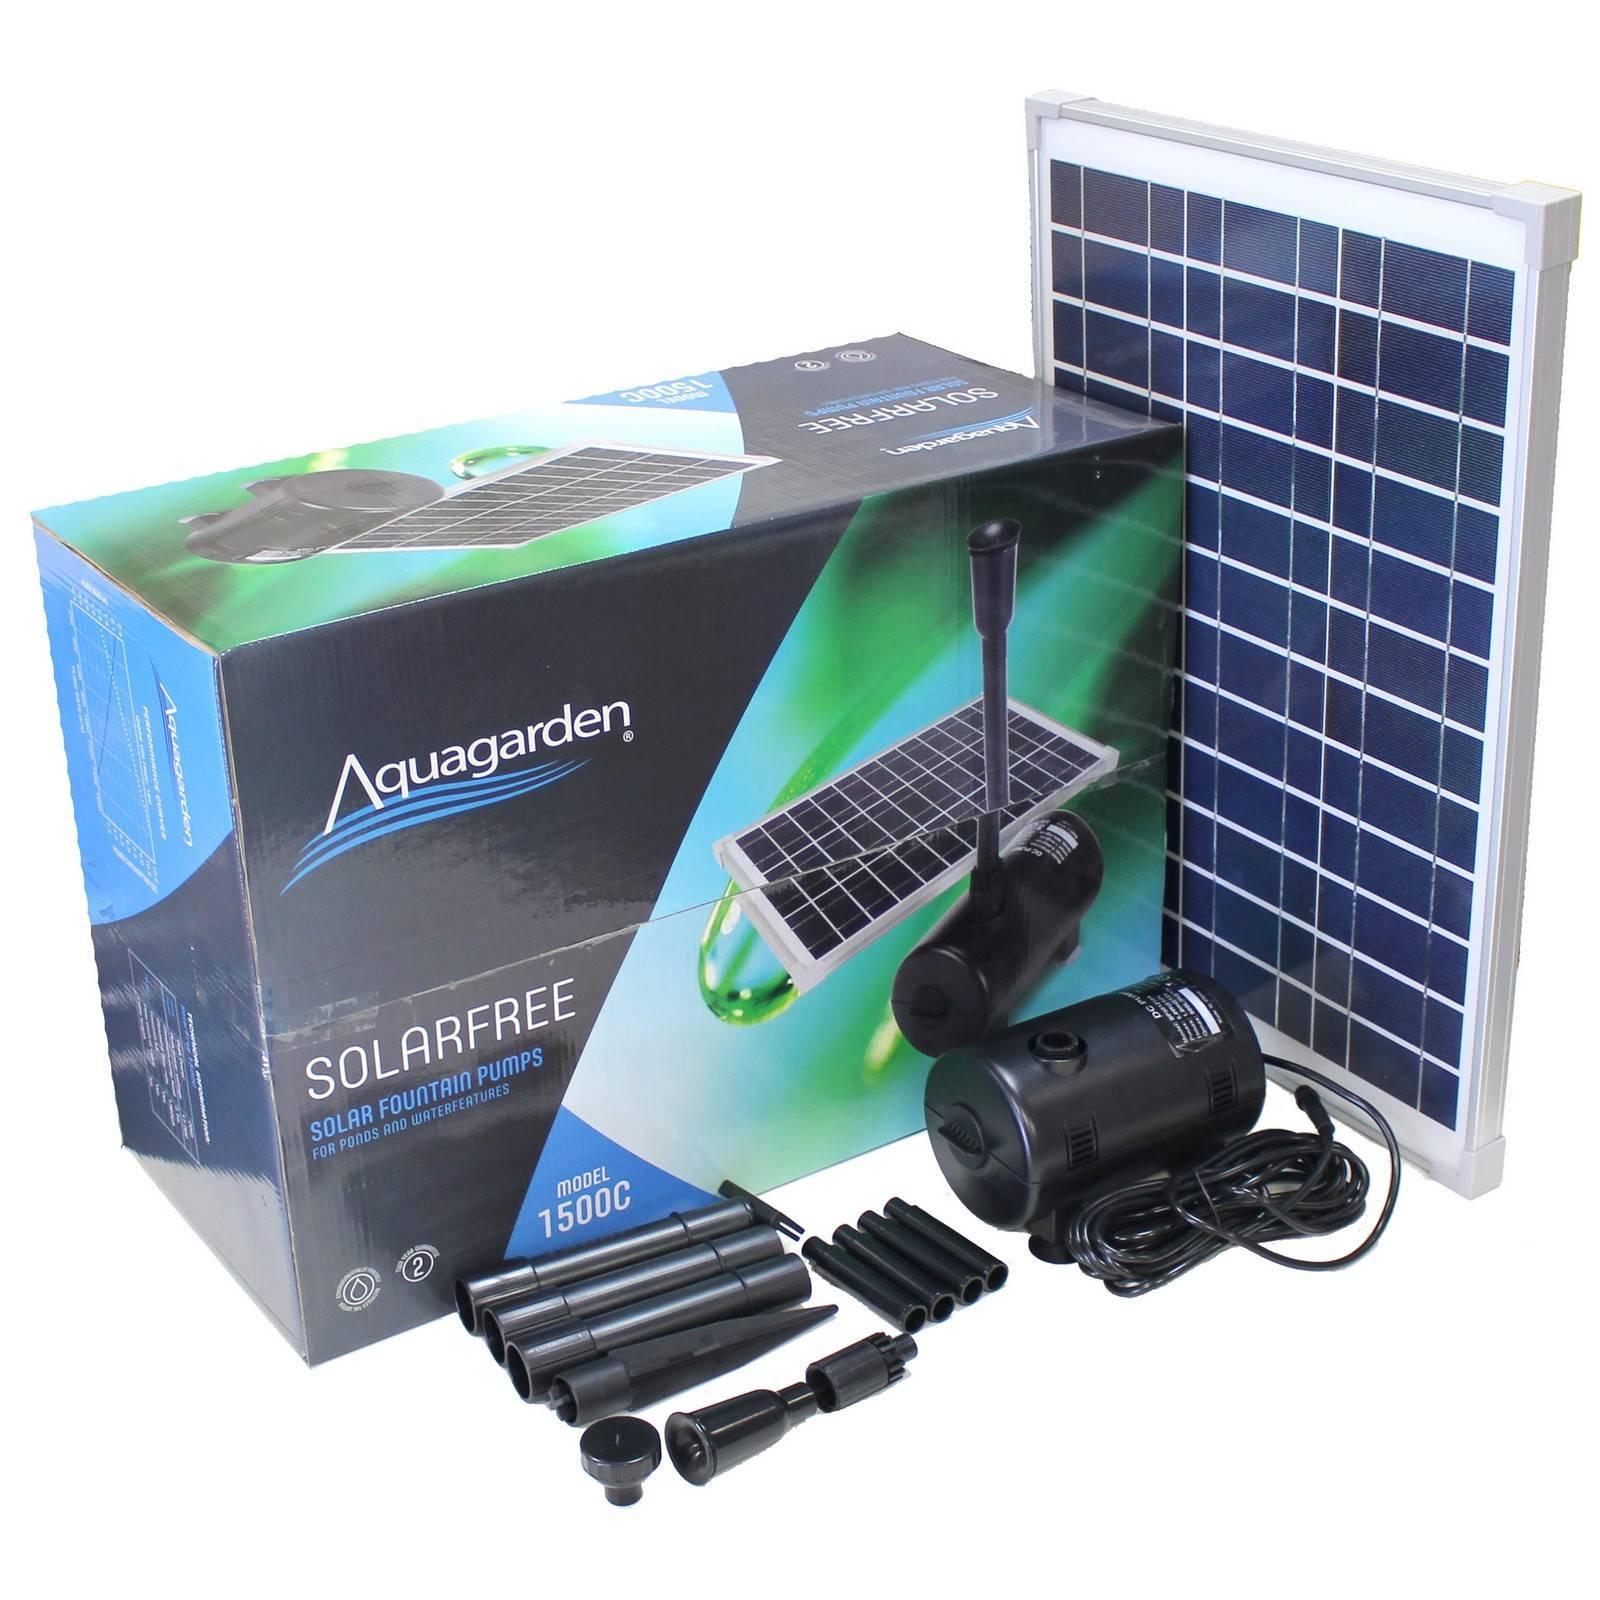 Solarfree 1500 solar pump 1360lph head aquagarden for Aquagarden 1200 pond pump